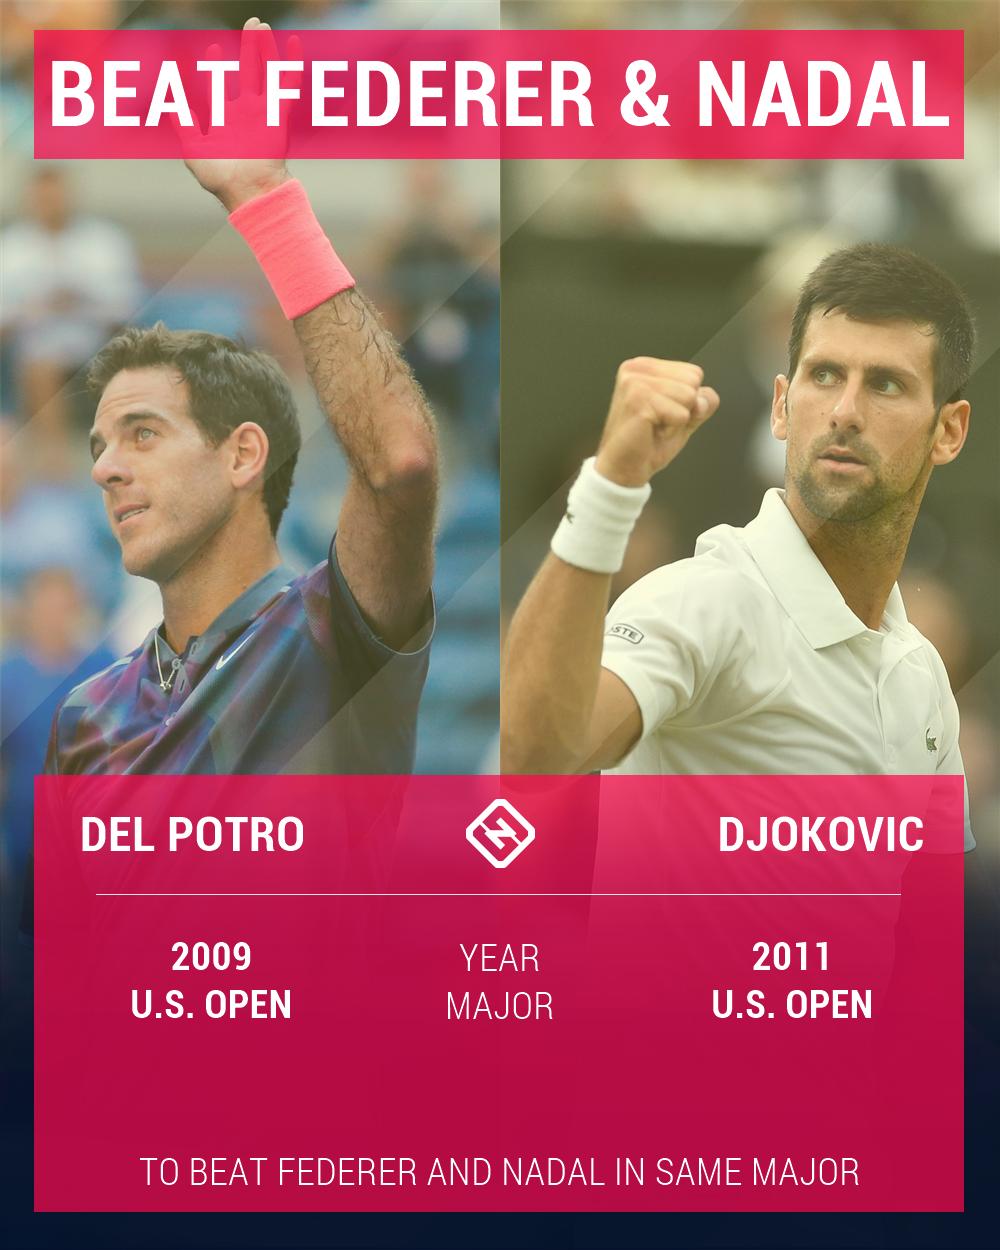 DelPotro-Djokovic-Wins.png